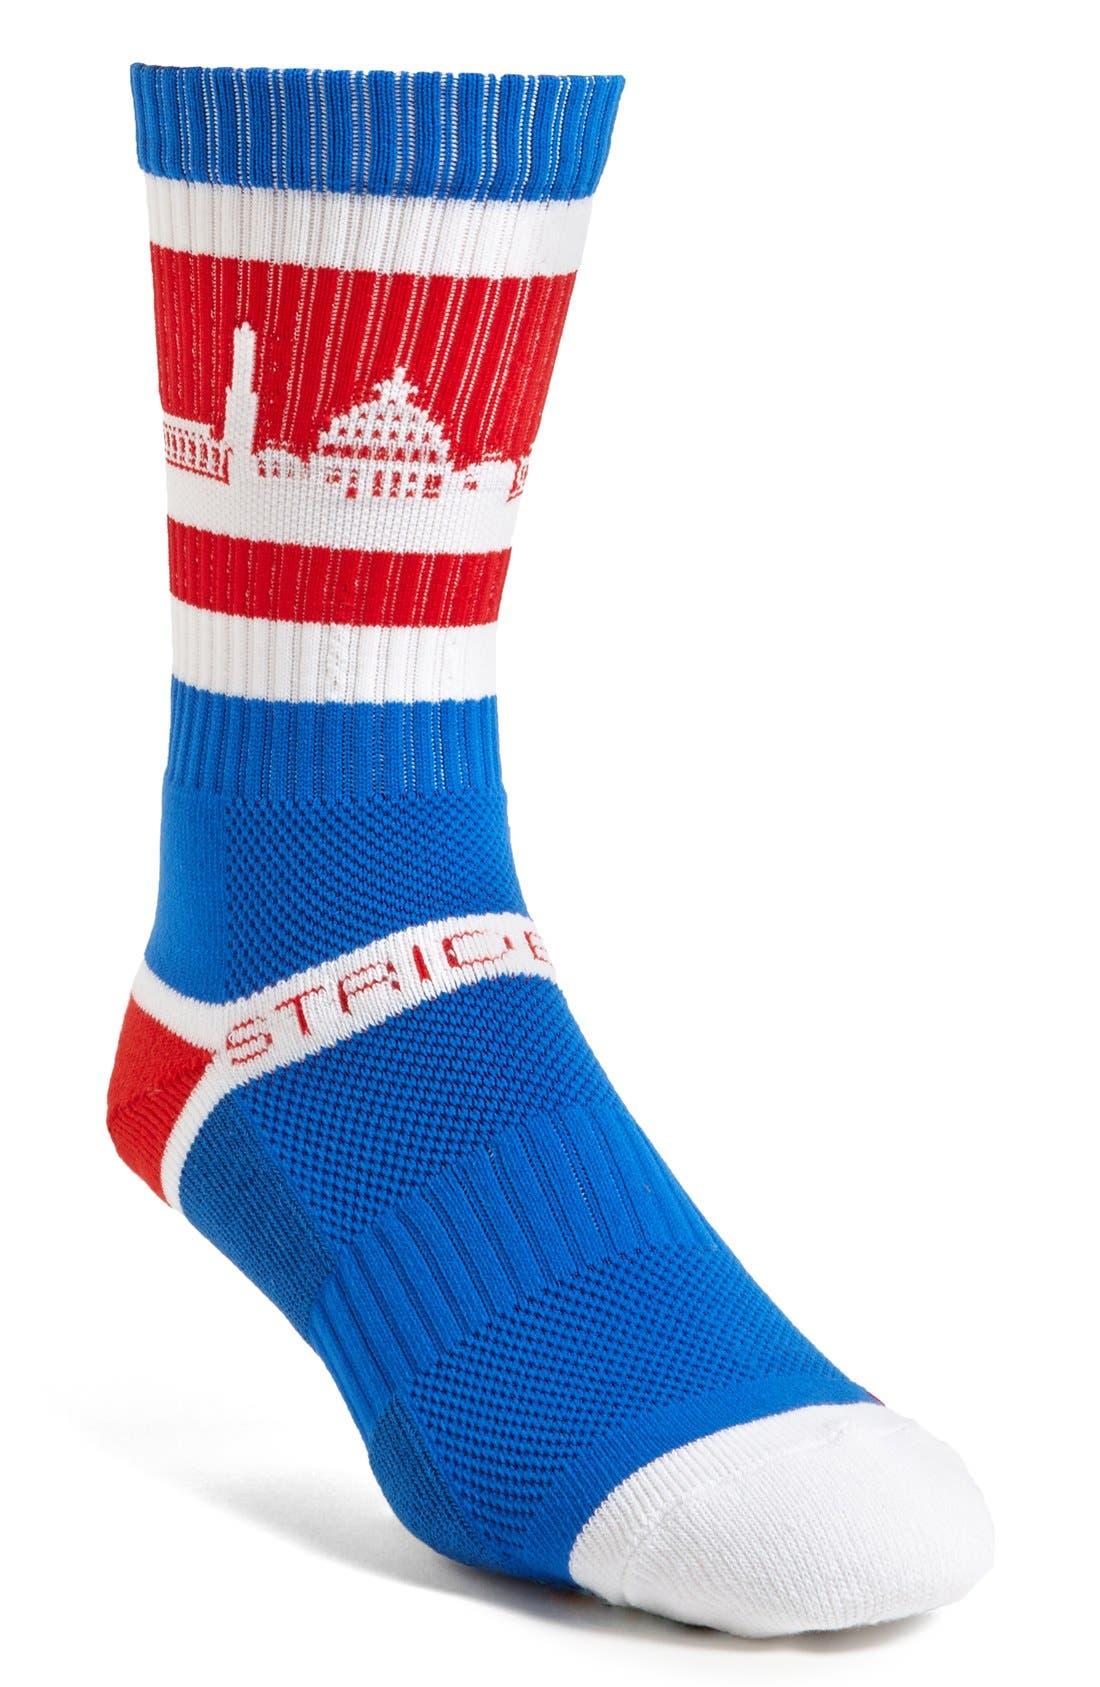 Alternate Image 1 Selected - STRIDELINE 'Washington D.C.' Socks